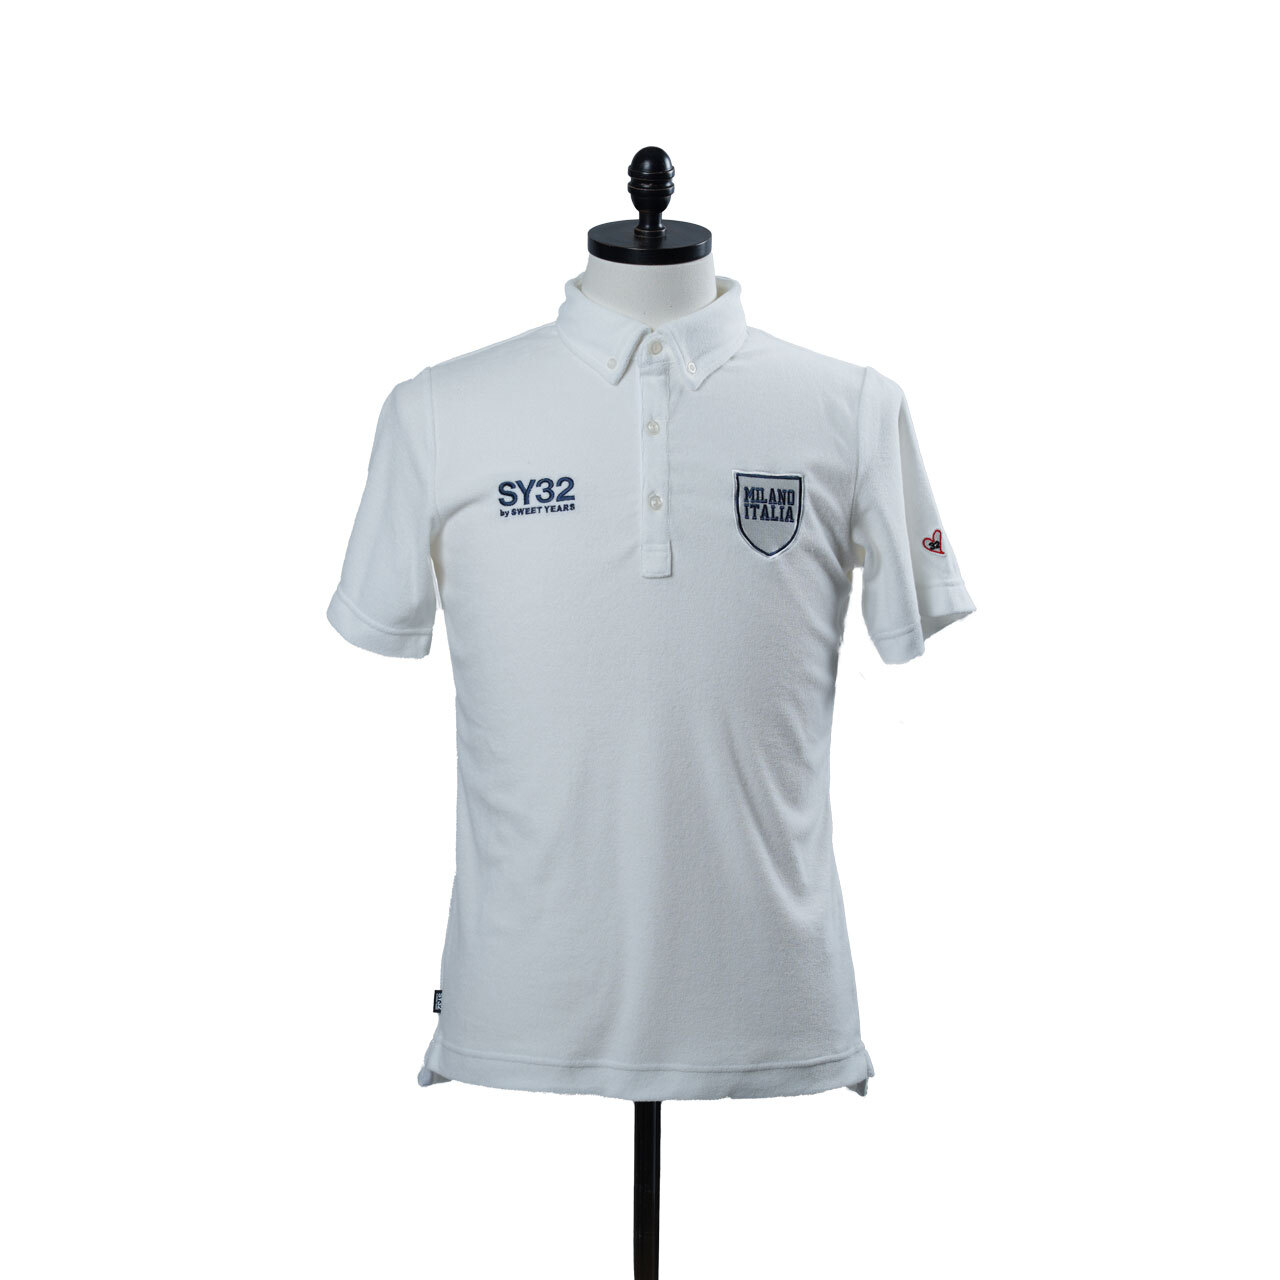 SY32 パイルポロシャツ(8004)